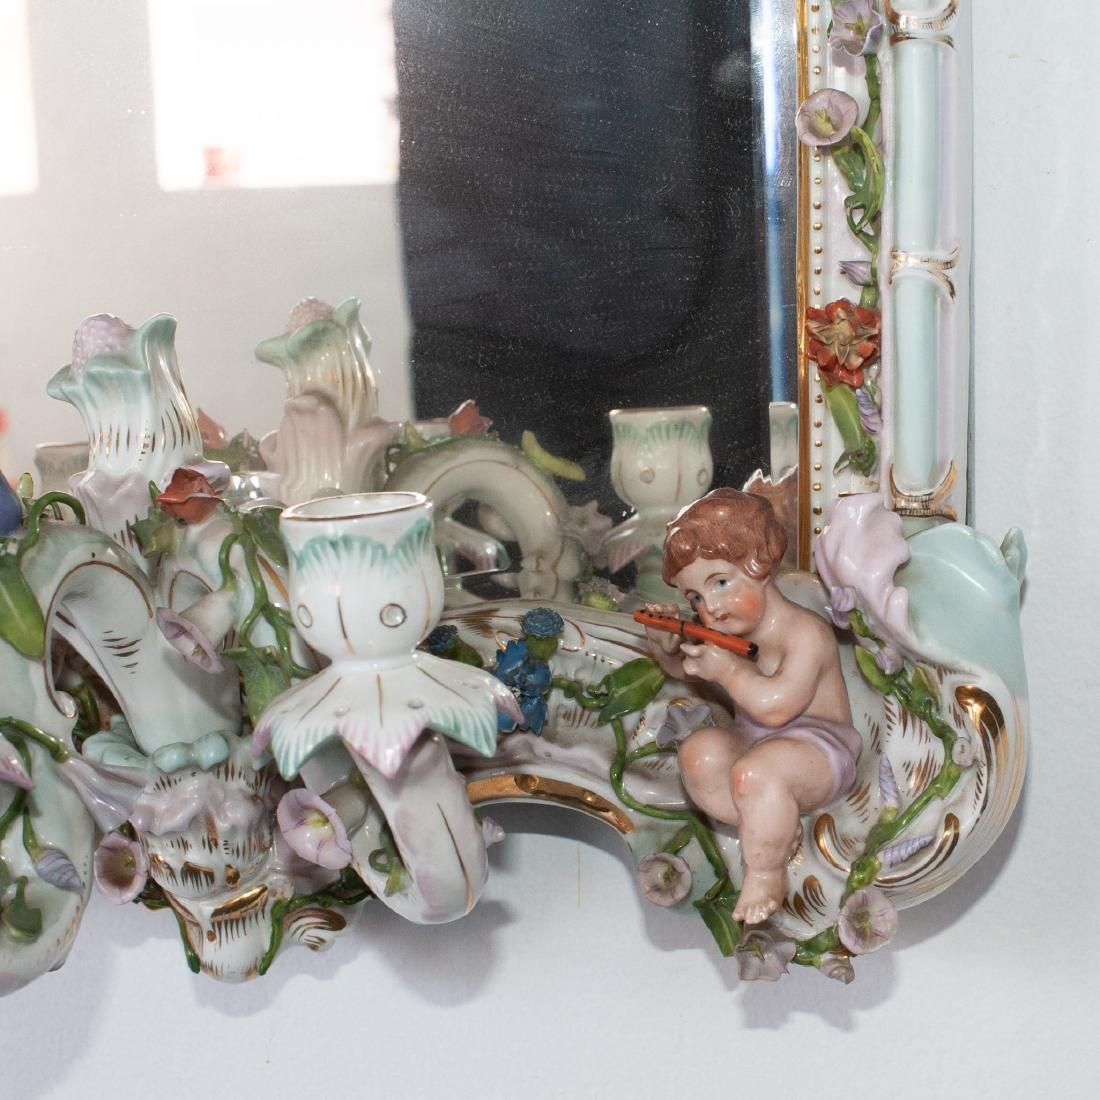 German Porcelain Mirror Sconce - 4